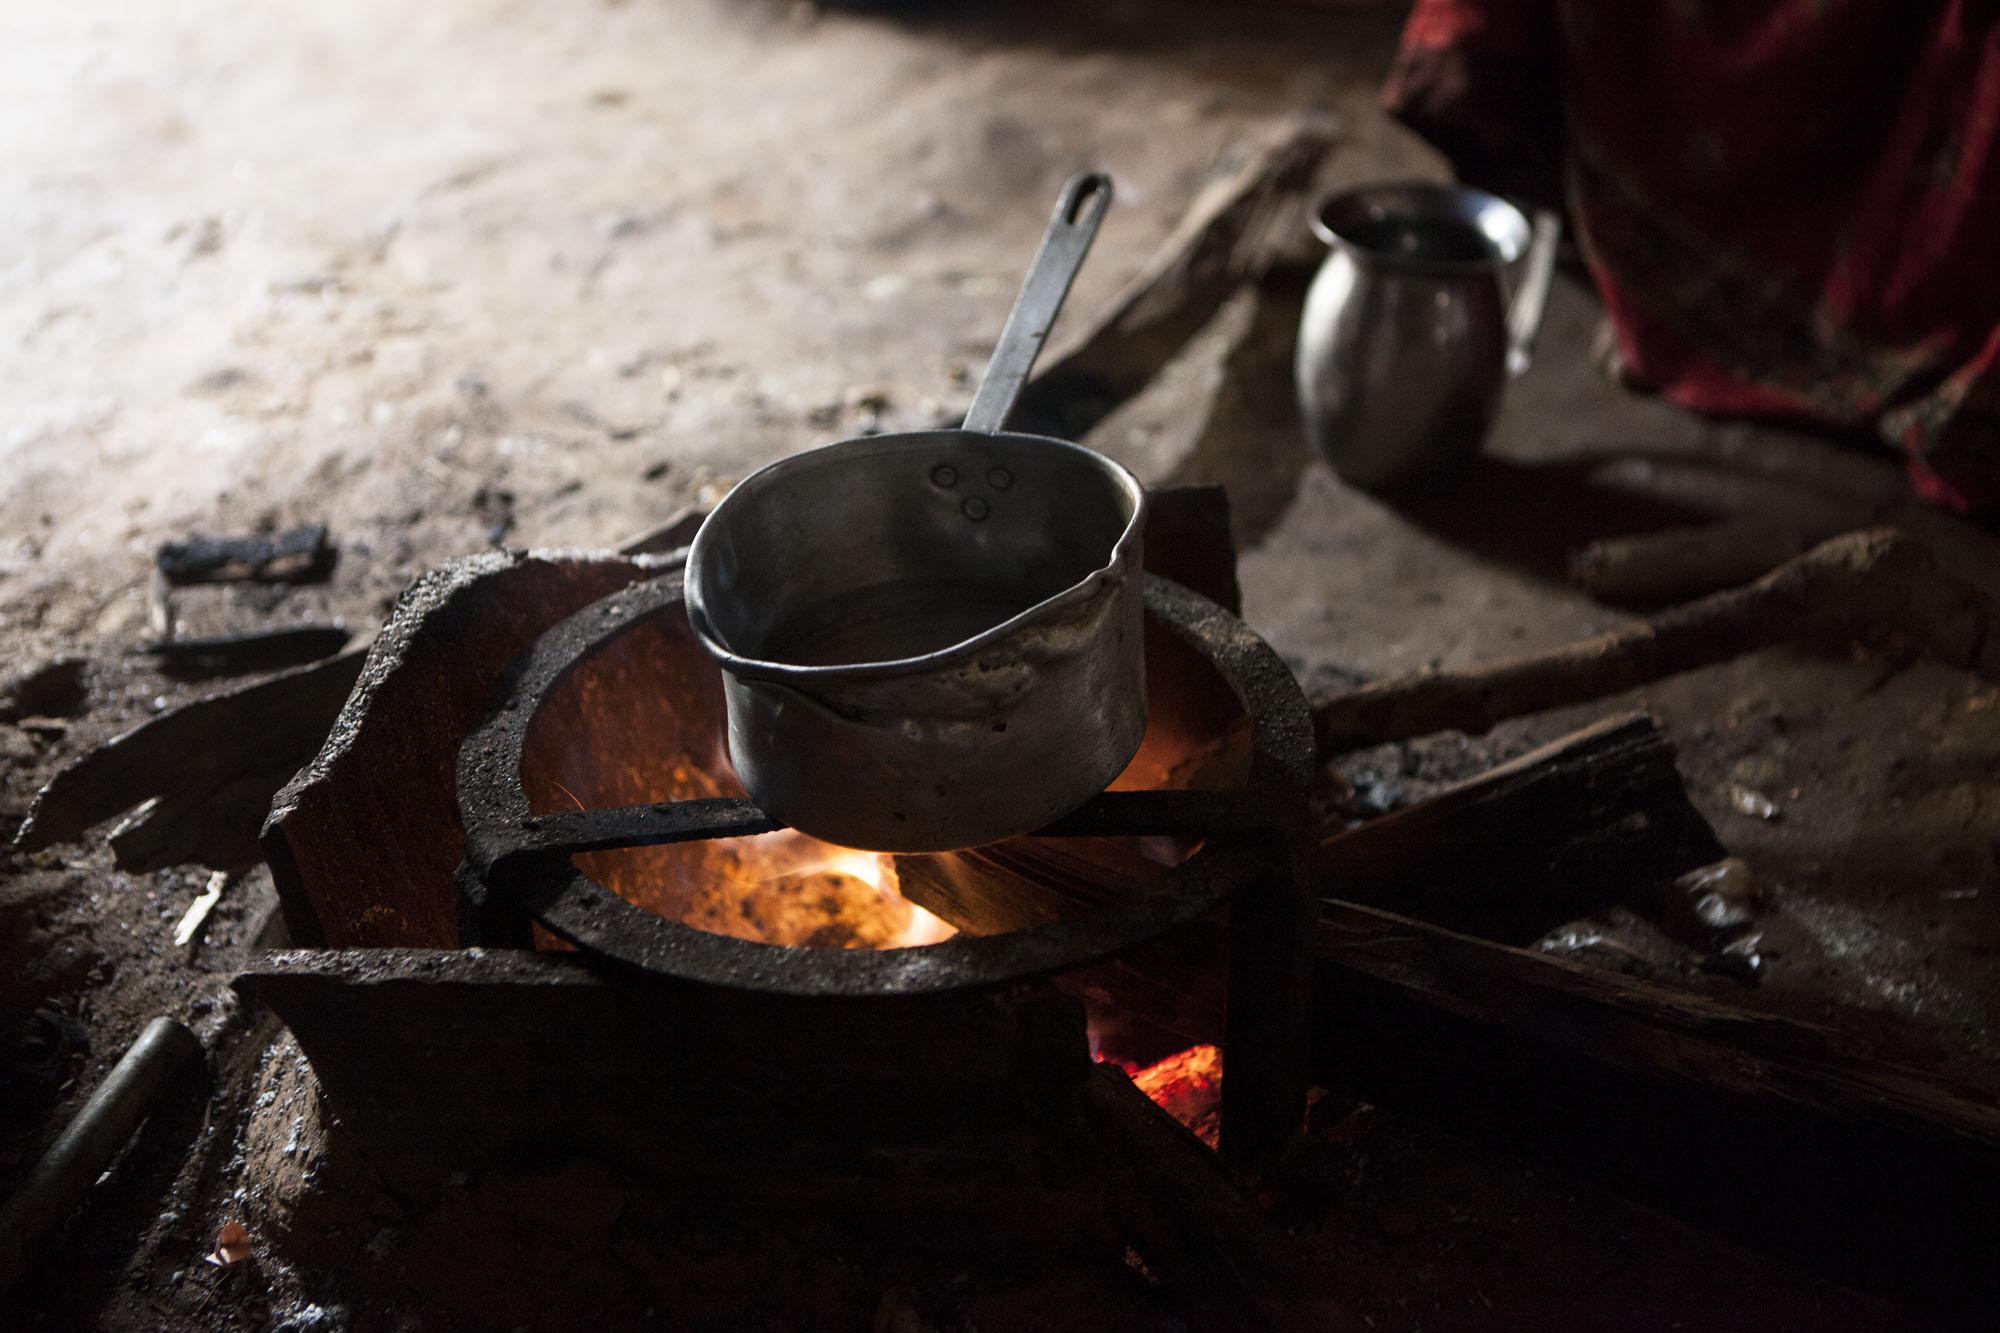 Surjakumari Sherstha age 60 prepares to make tea inside of her temporary shelter. Tauthali Village ward No. 3, Sindupalchowk District, Nepal. August 6, 2015.